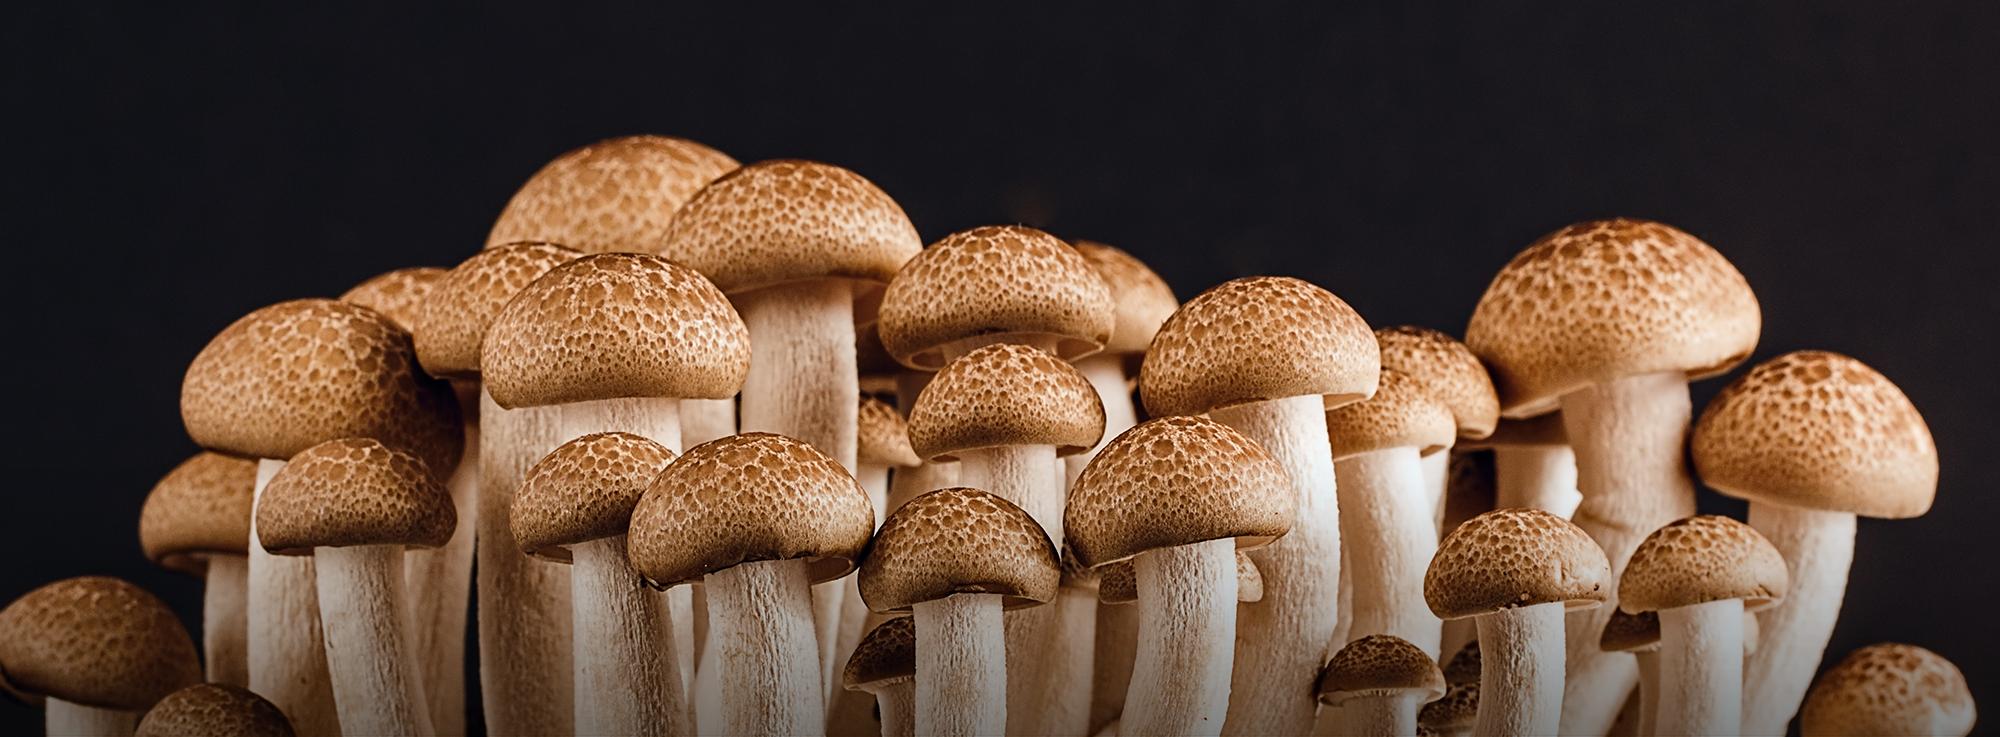 Ricetta: Omelette ai funghi cardoncelli